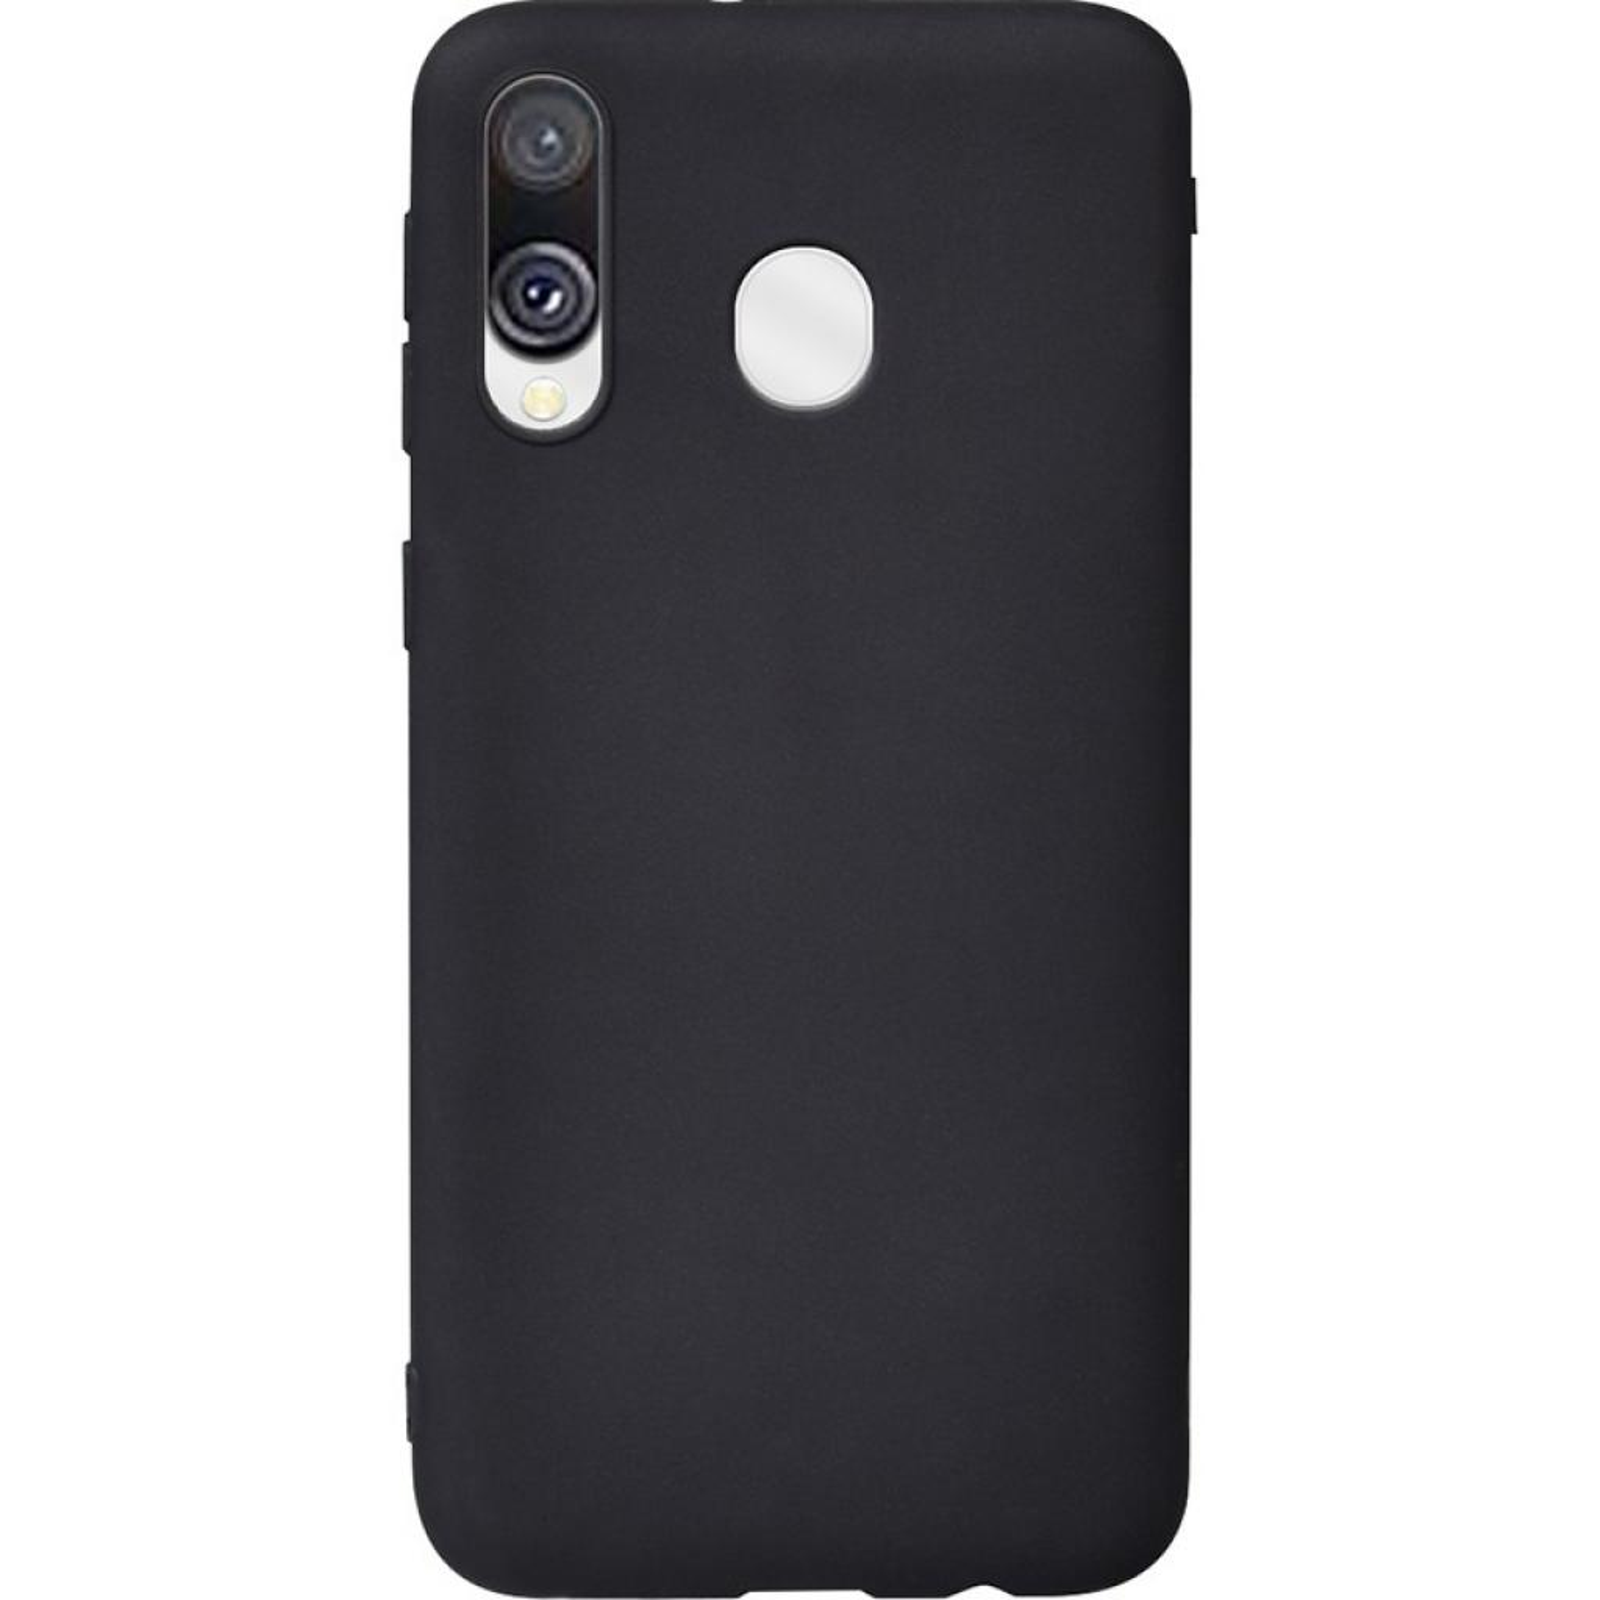 Чехол для моб. телефона Toto 1mm Matt TPU Case Samsung Galaxy A40s/M30 Black (F_102662)